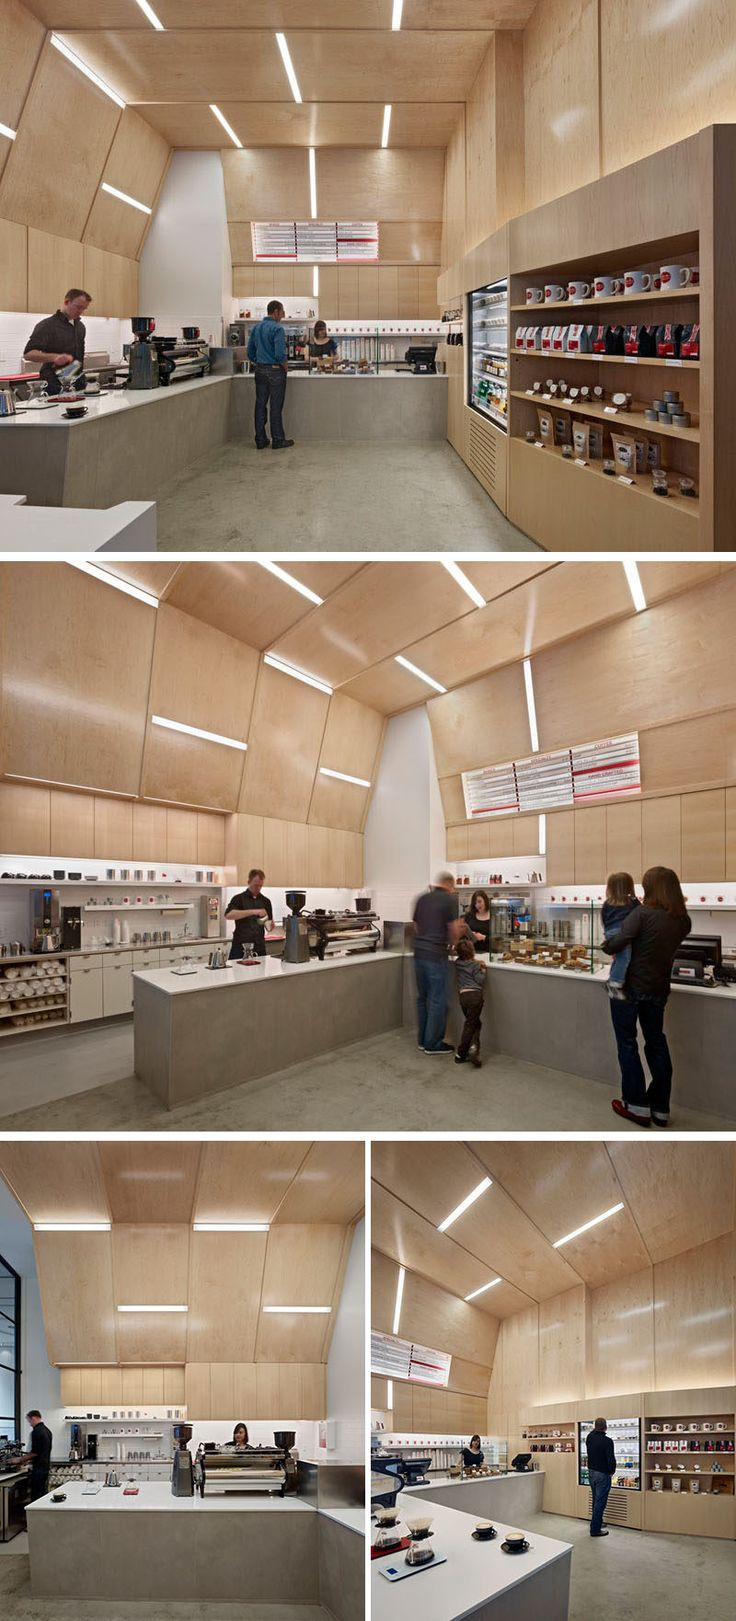 308 best interior - f&b images on pinterest | restaurant design